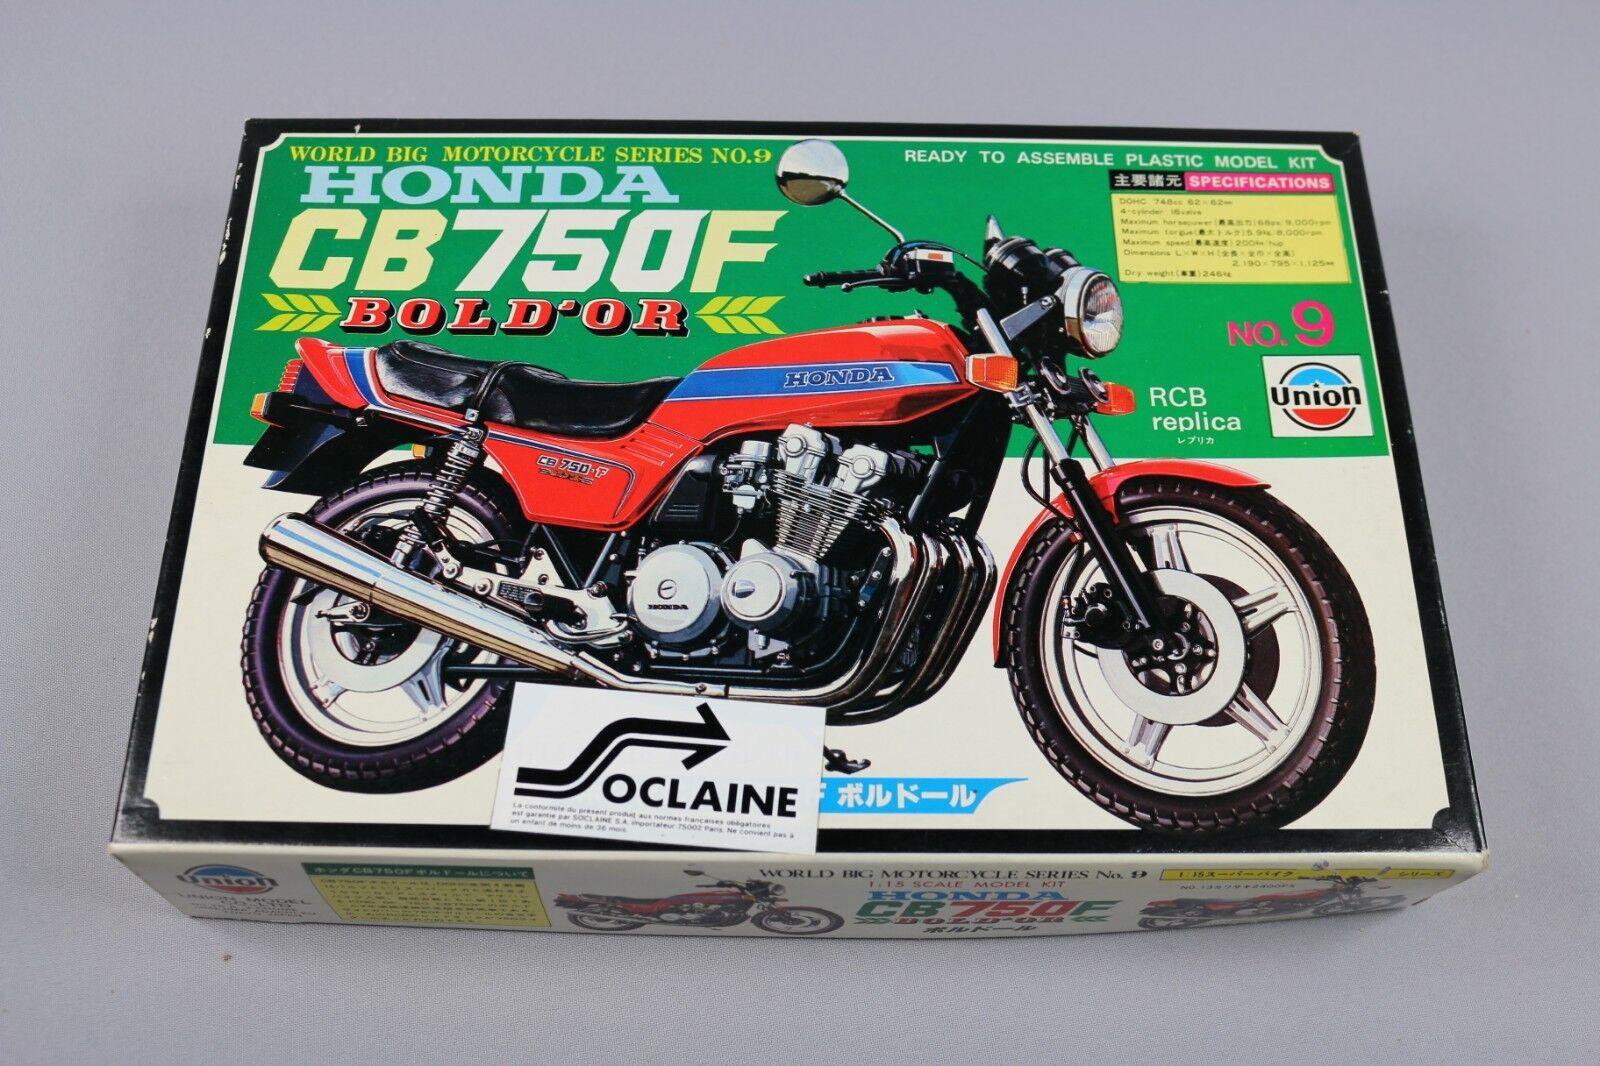 ZF1007 Union 1 15 maquette M-09 700 Honda CB750F Bol d'Or World Motorcycle moto